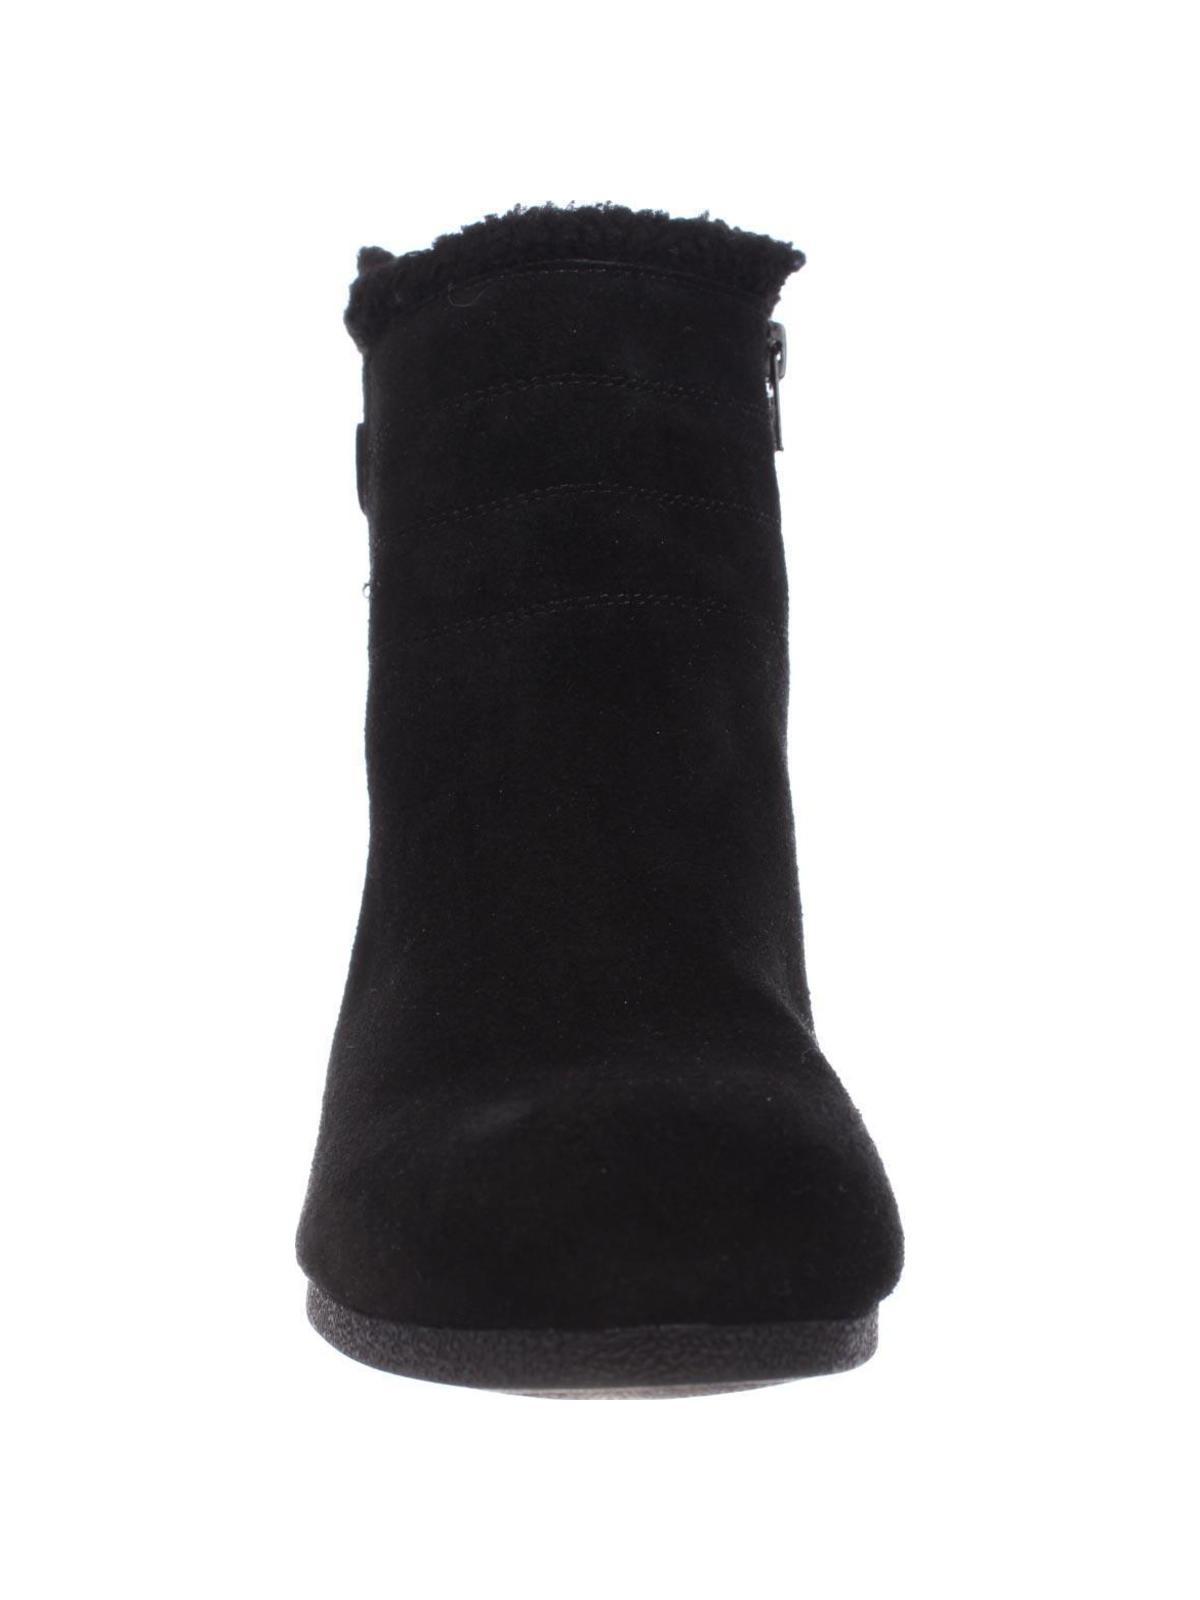 les femmes pattii wedge mémoire gb35 chaussons, chaussons, gb35 noir 3bfaee